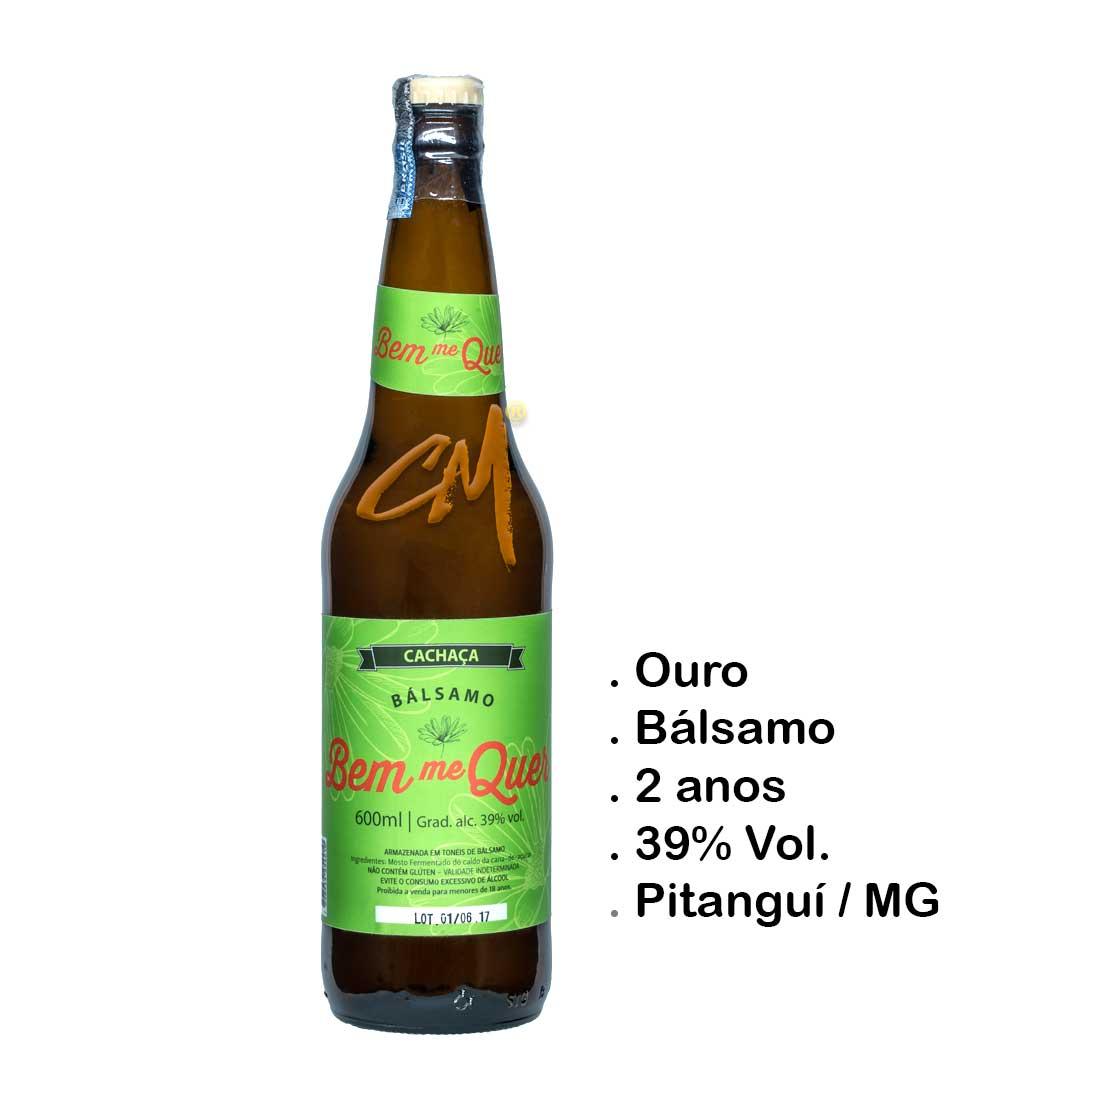 Cachaça Bem Me Quer Bálsamo 600 ml (Pitanguí - MG)